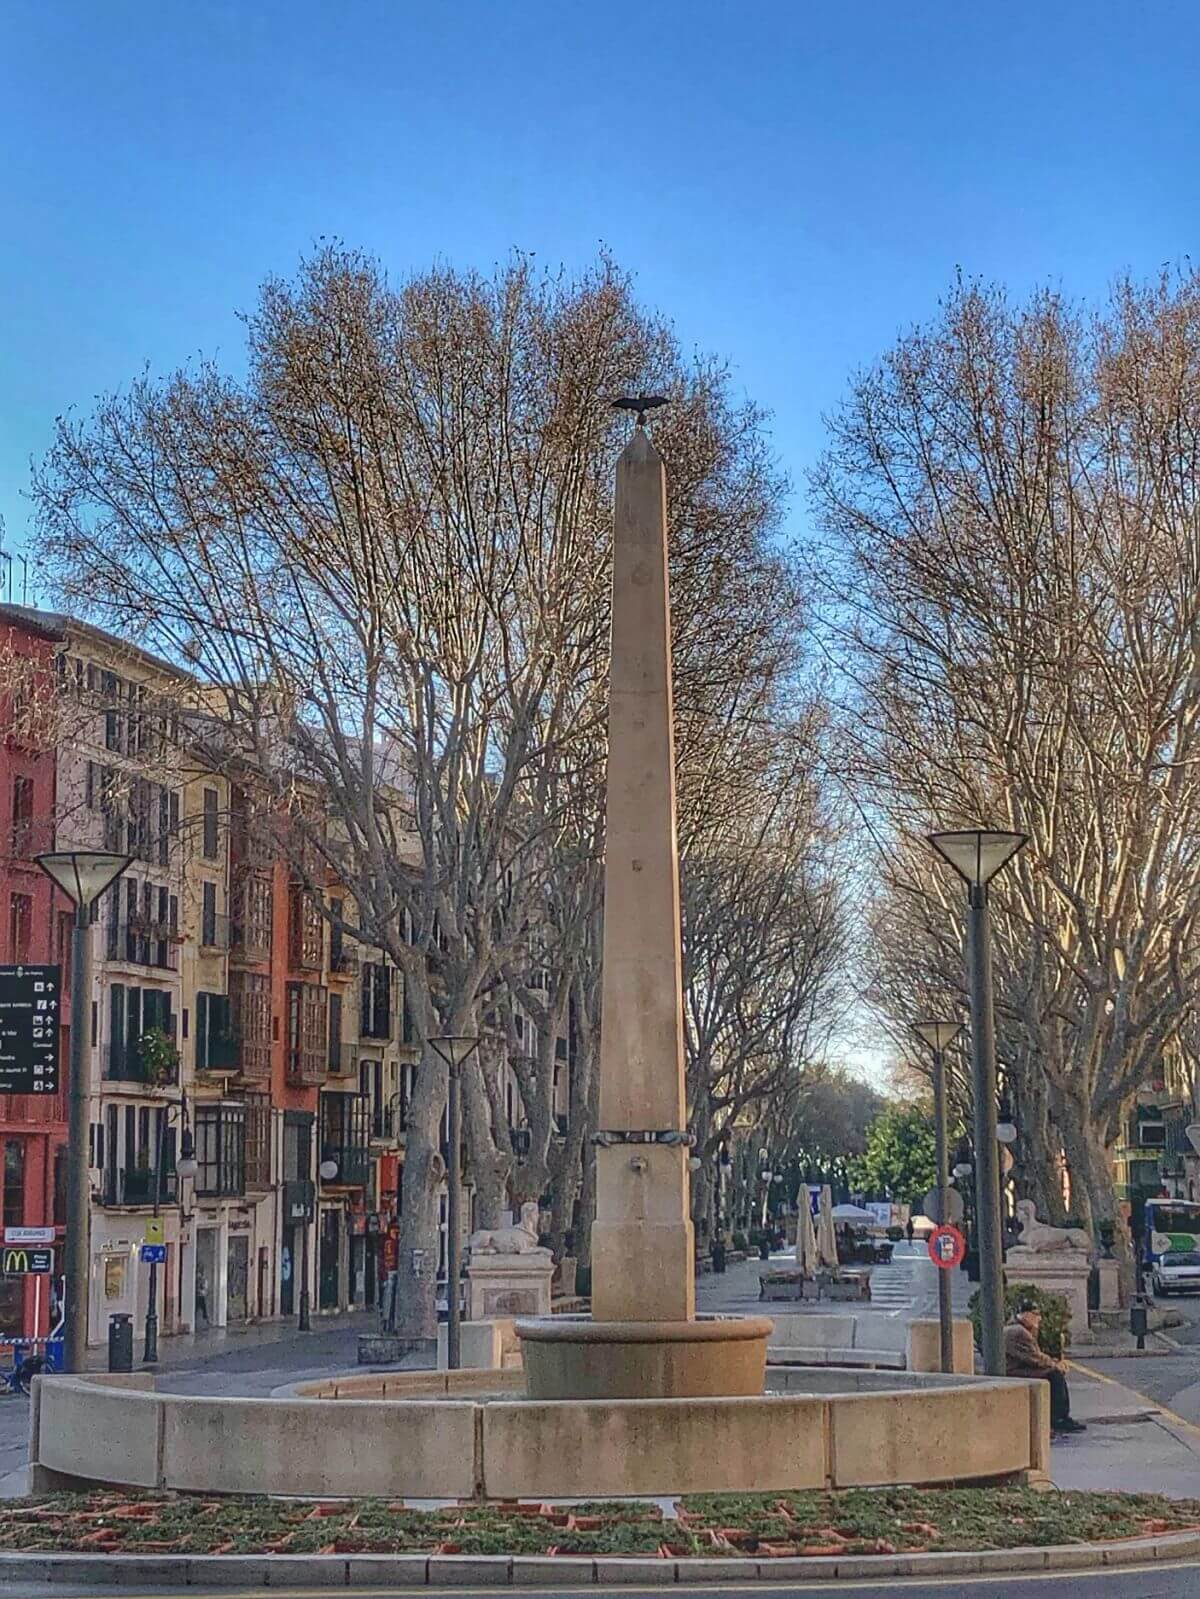 Plaza de las tortugas de Palma